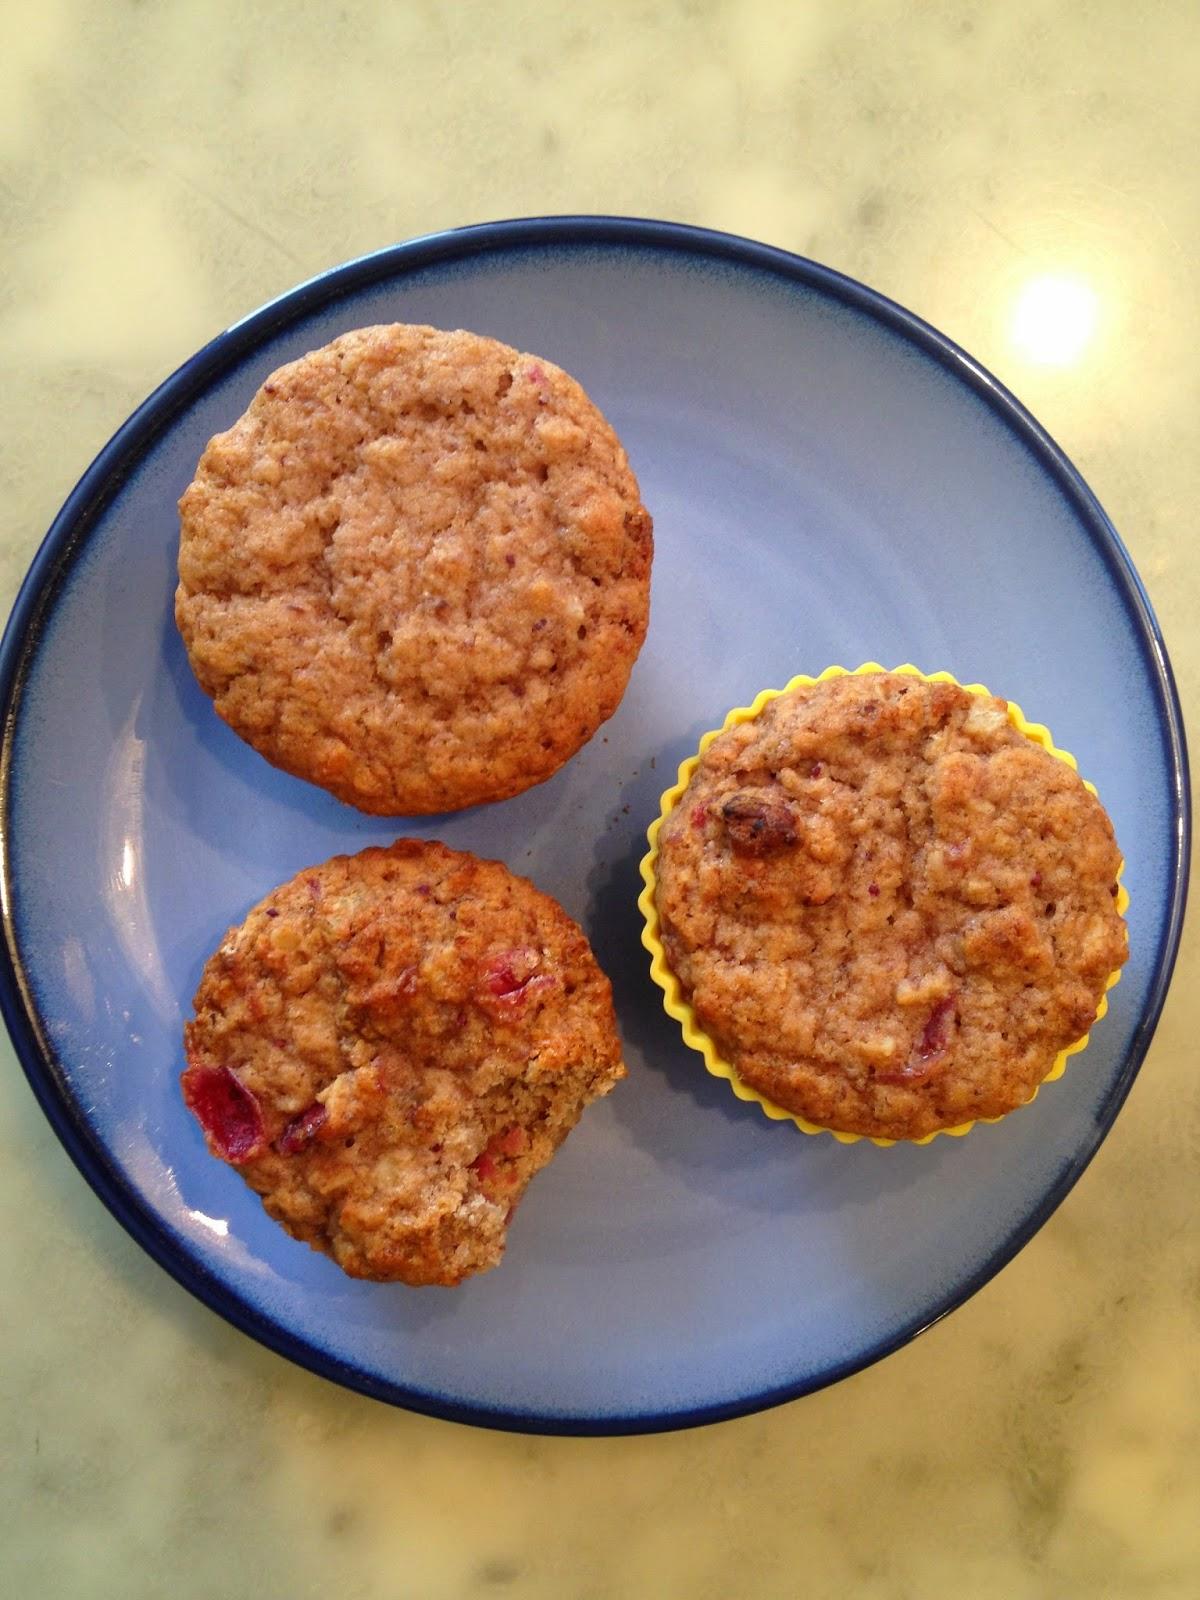 http://ablueskykindoflife.blogspot.com/2014/12/leftover-cranberry-sauce-muffins.html